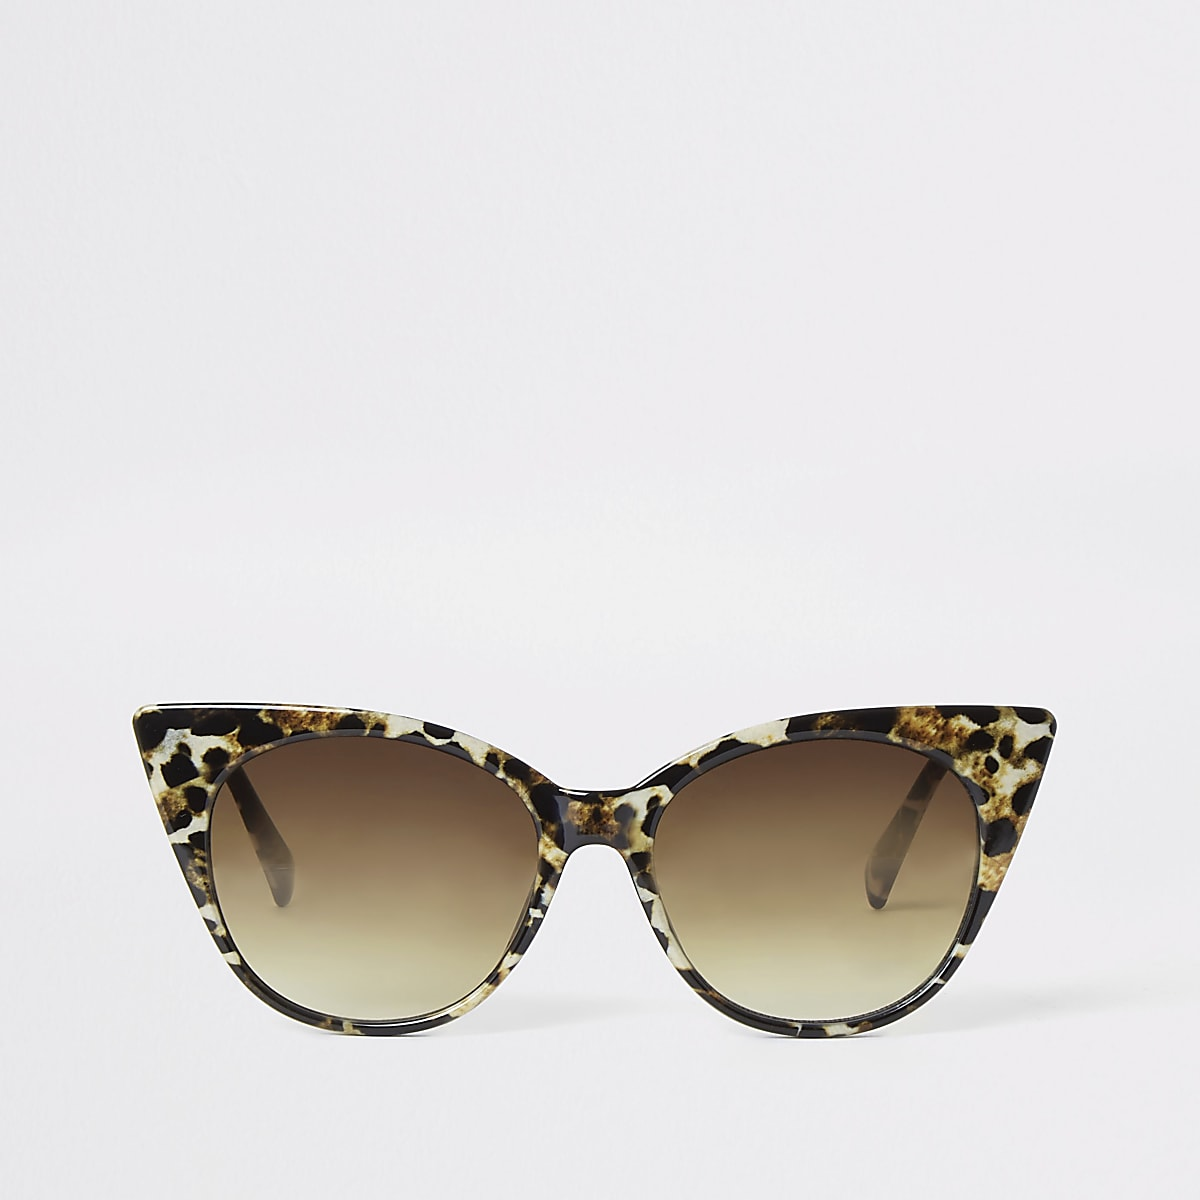 Brown leopard print cat eye sunglasses